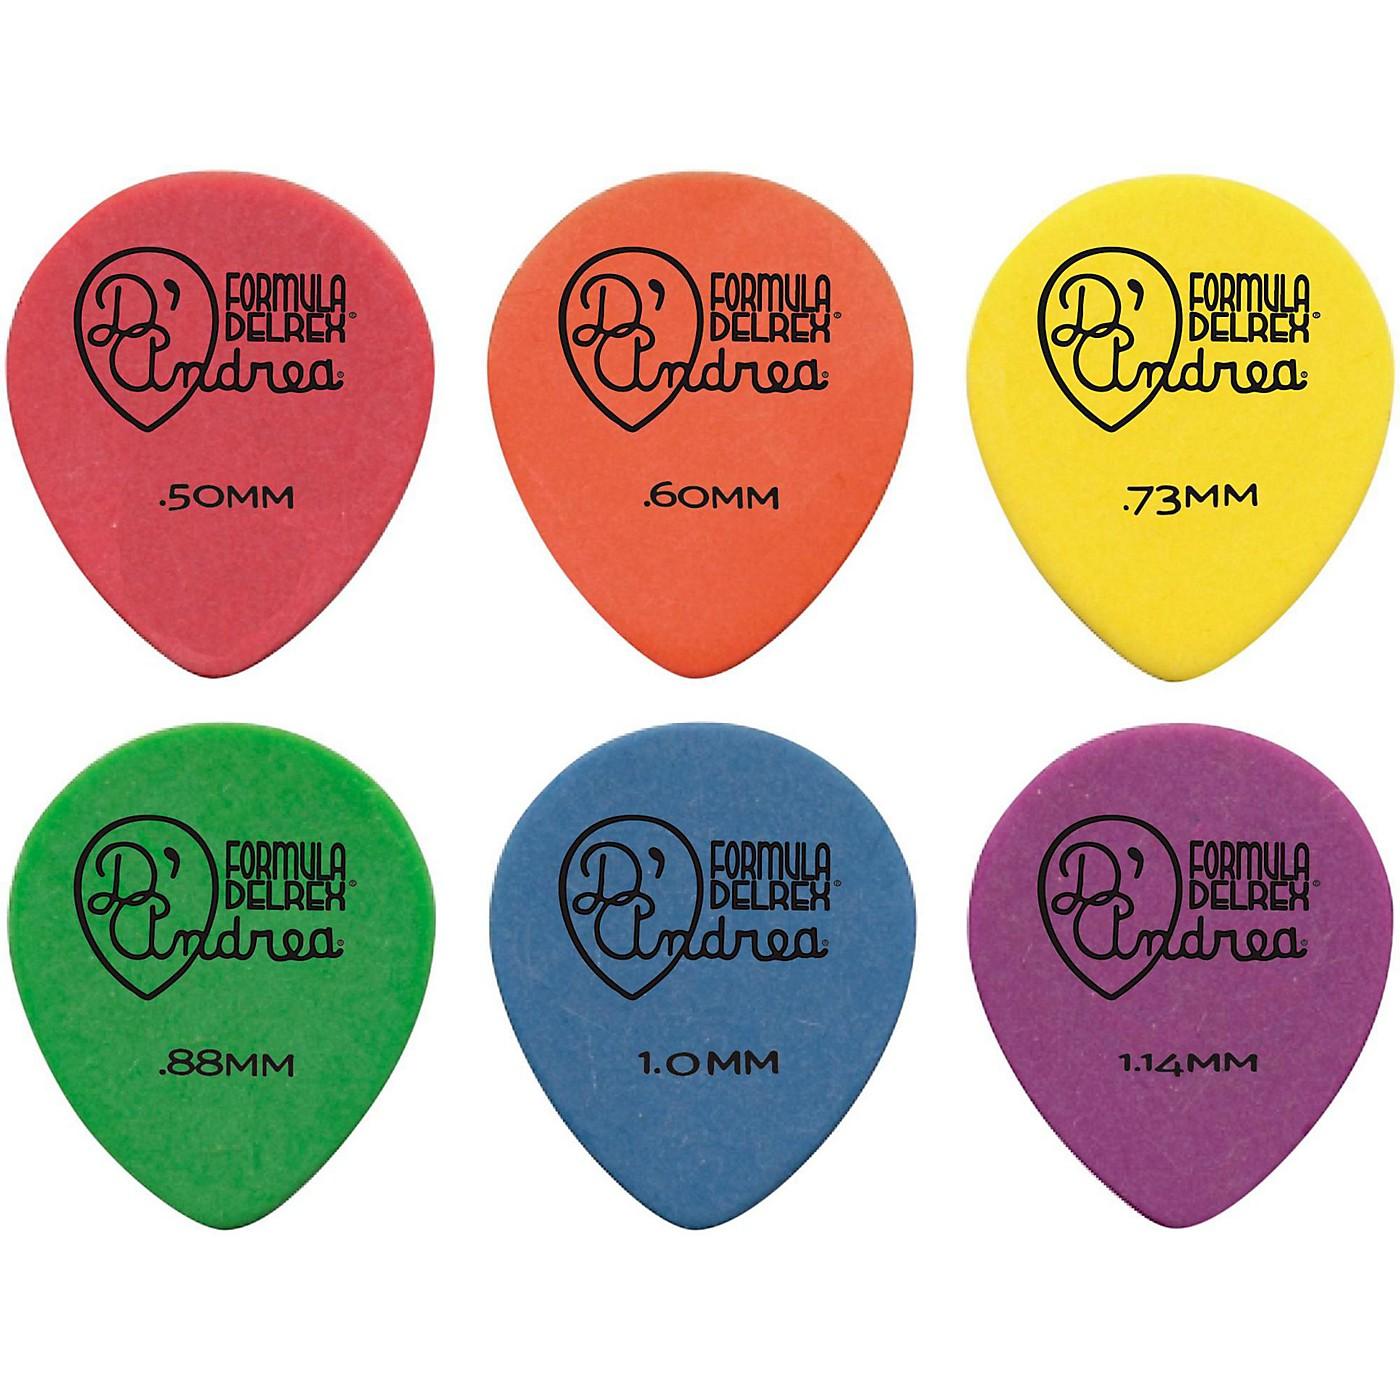 D'Andrea 347 Rounded Teardrop Delrex Delrin Guitar Picks - One Dozen thumbnail